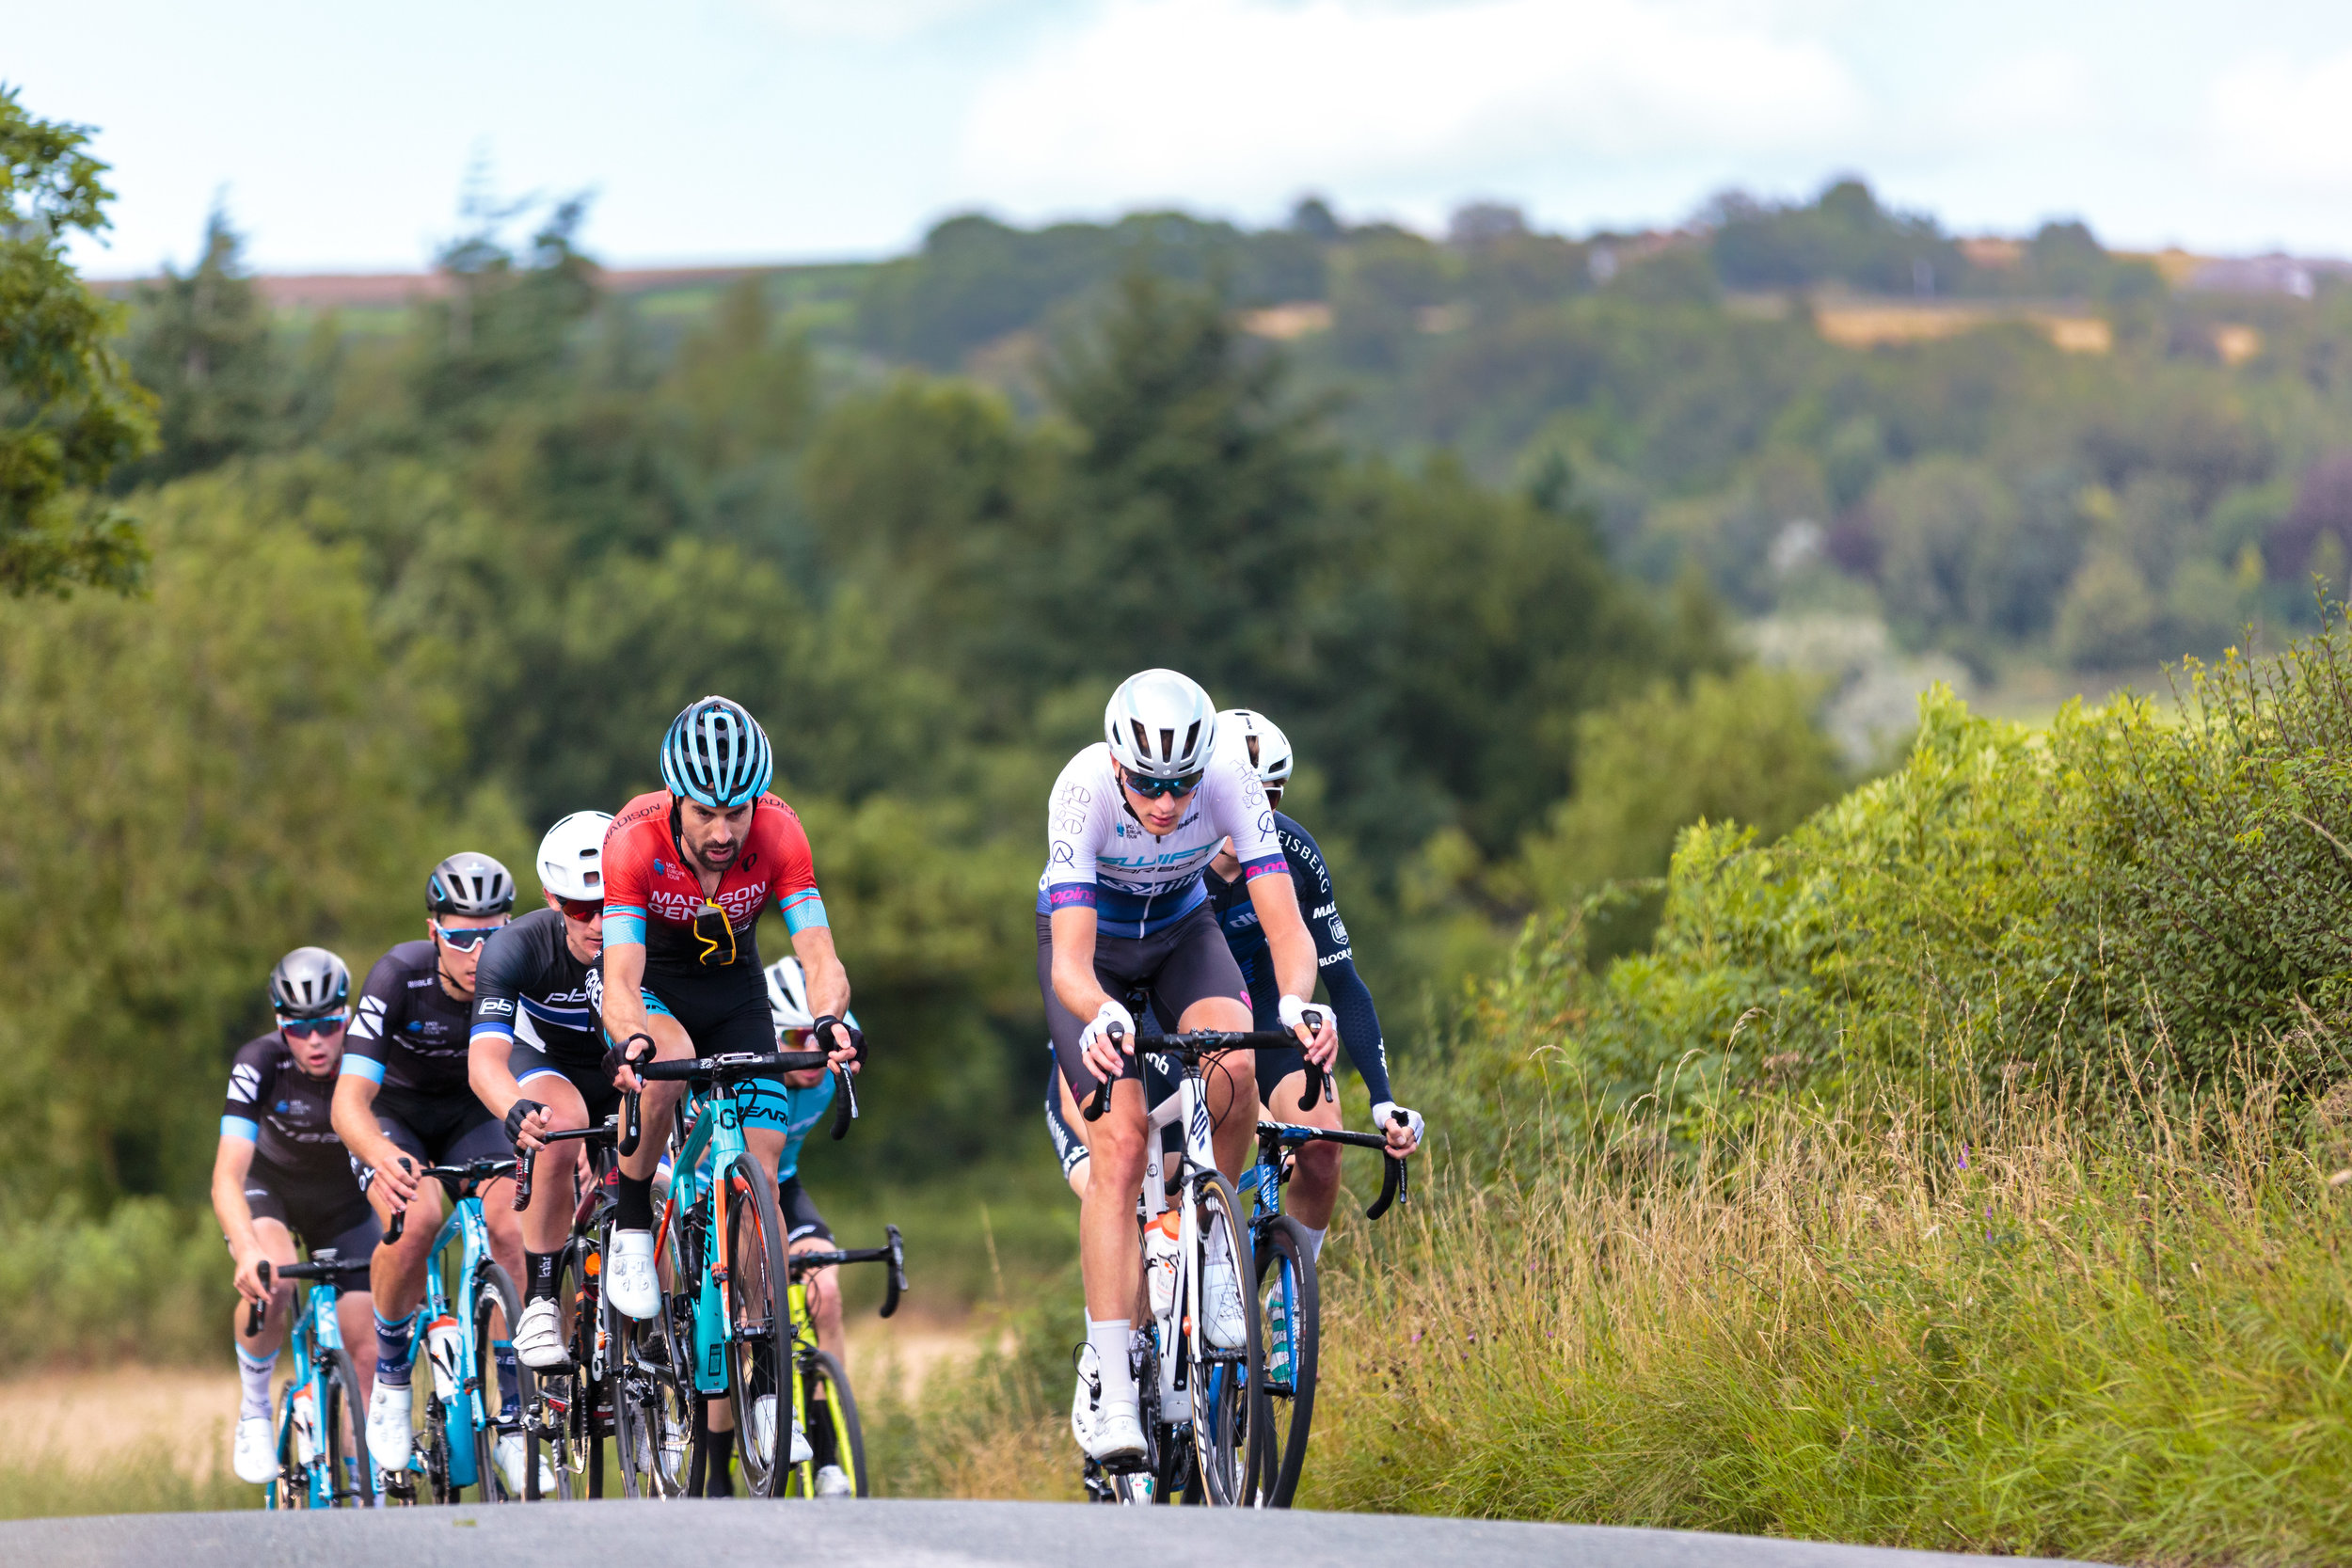 Swift Pro Cycling Lead a bunch up a climb